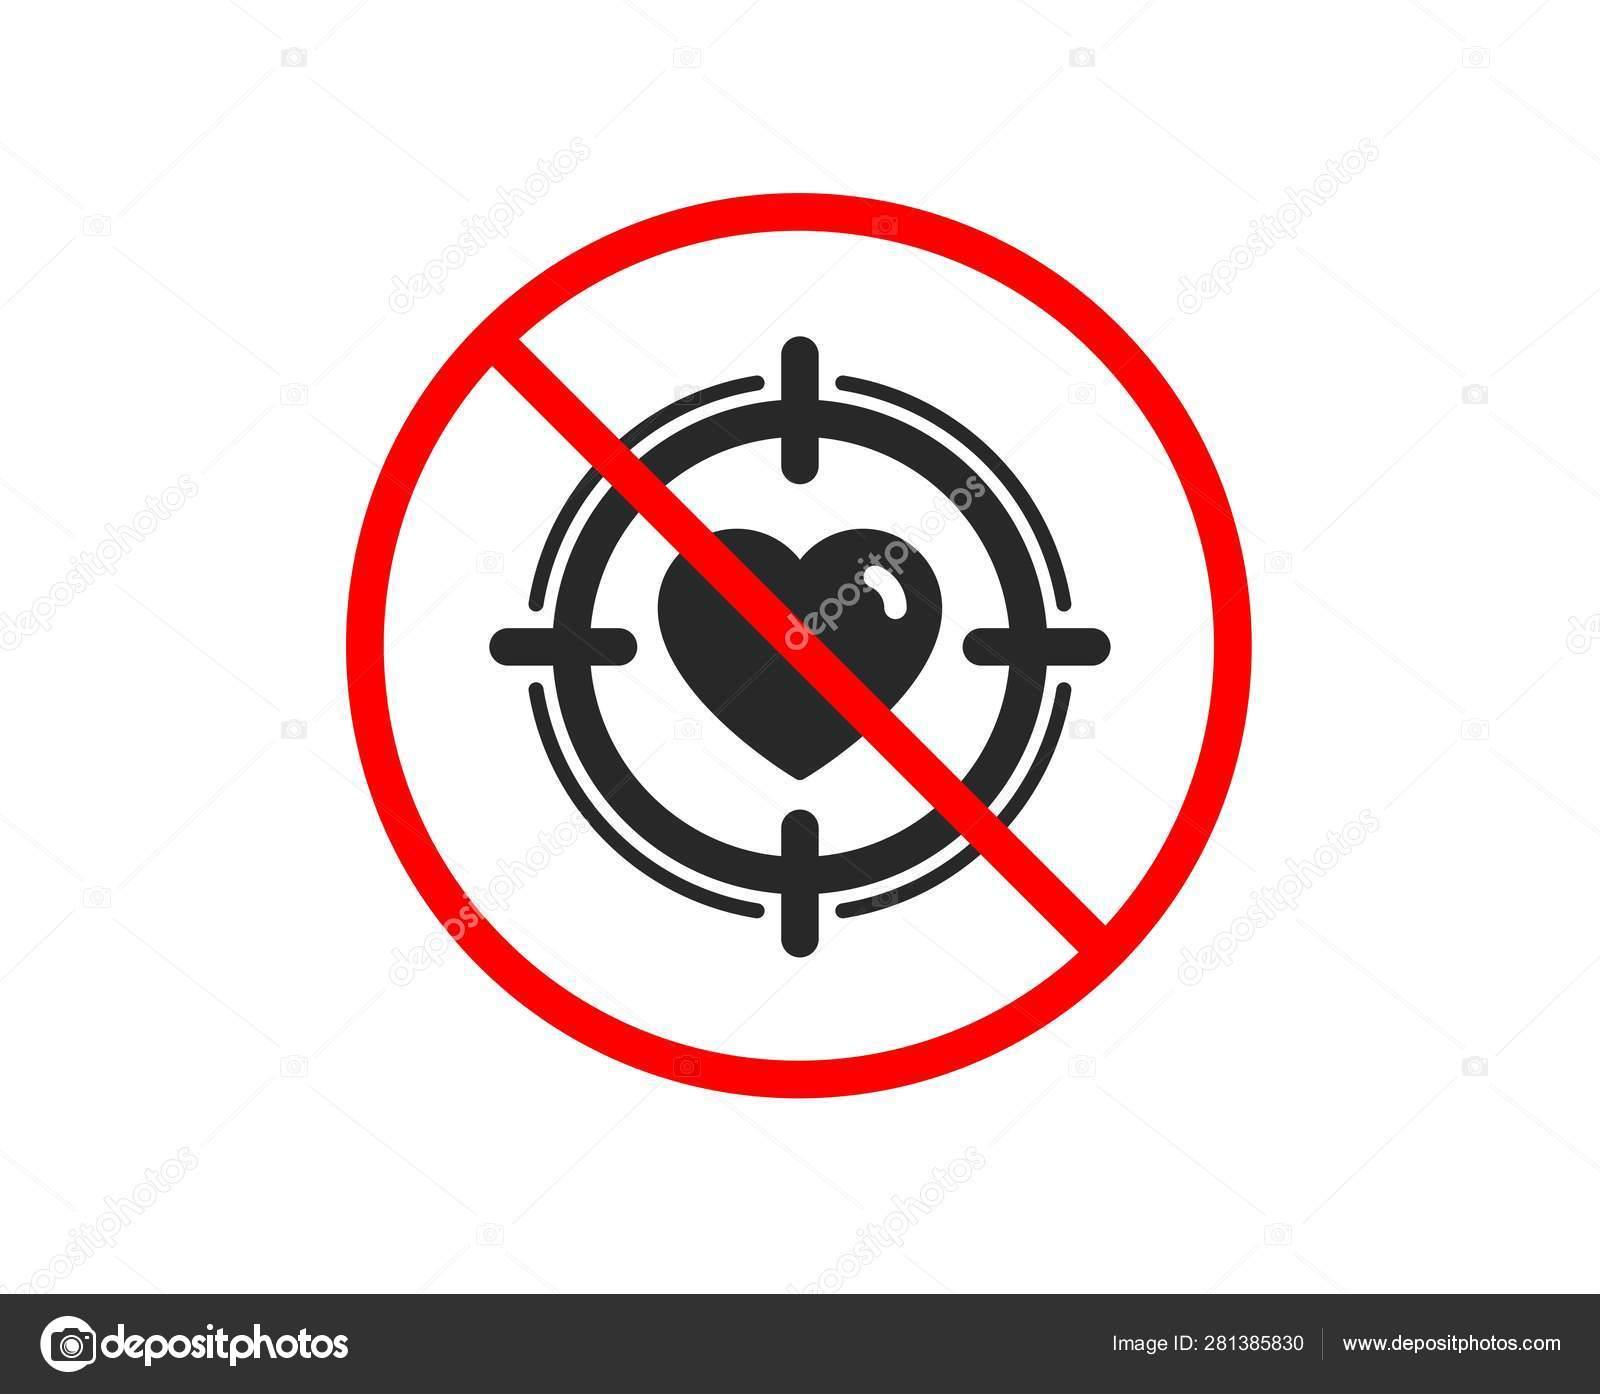 heart in target aim icon love symbol vector stock vector c blankstock 281385830 heart in target aim icon love symbol vector stock vector c blankstock 281385830